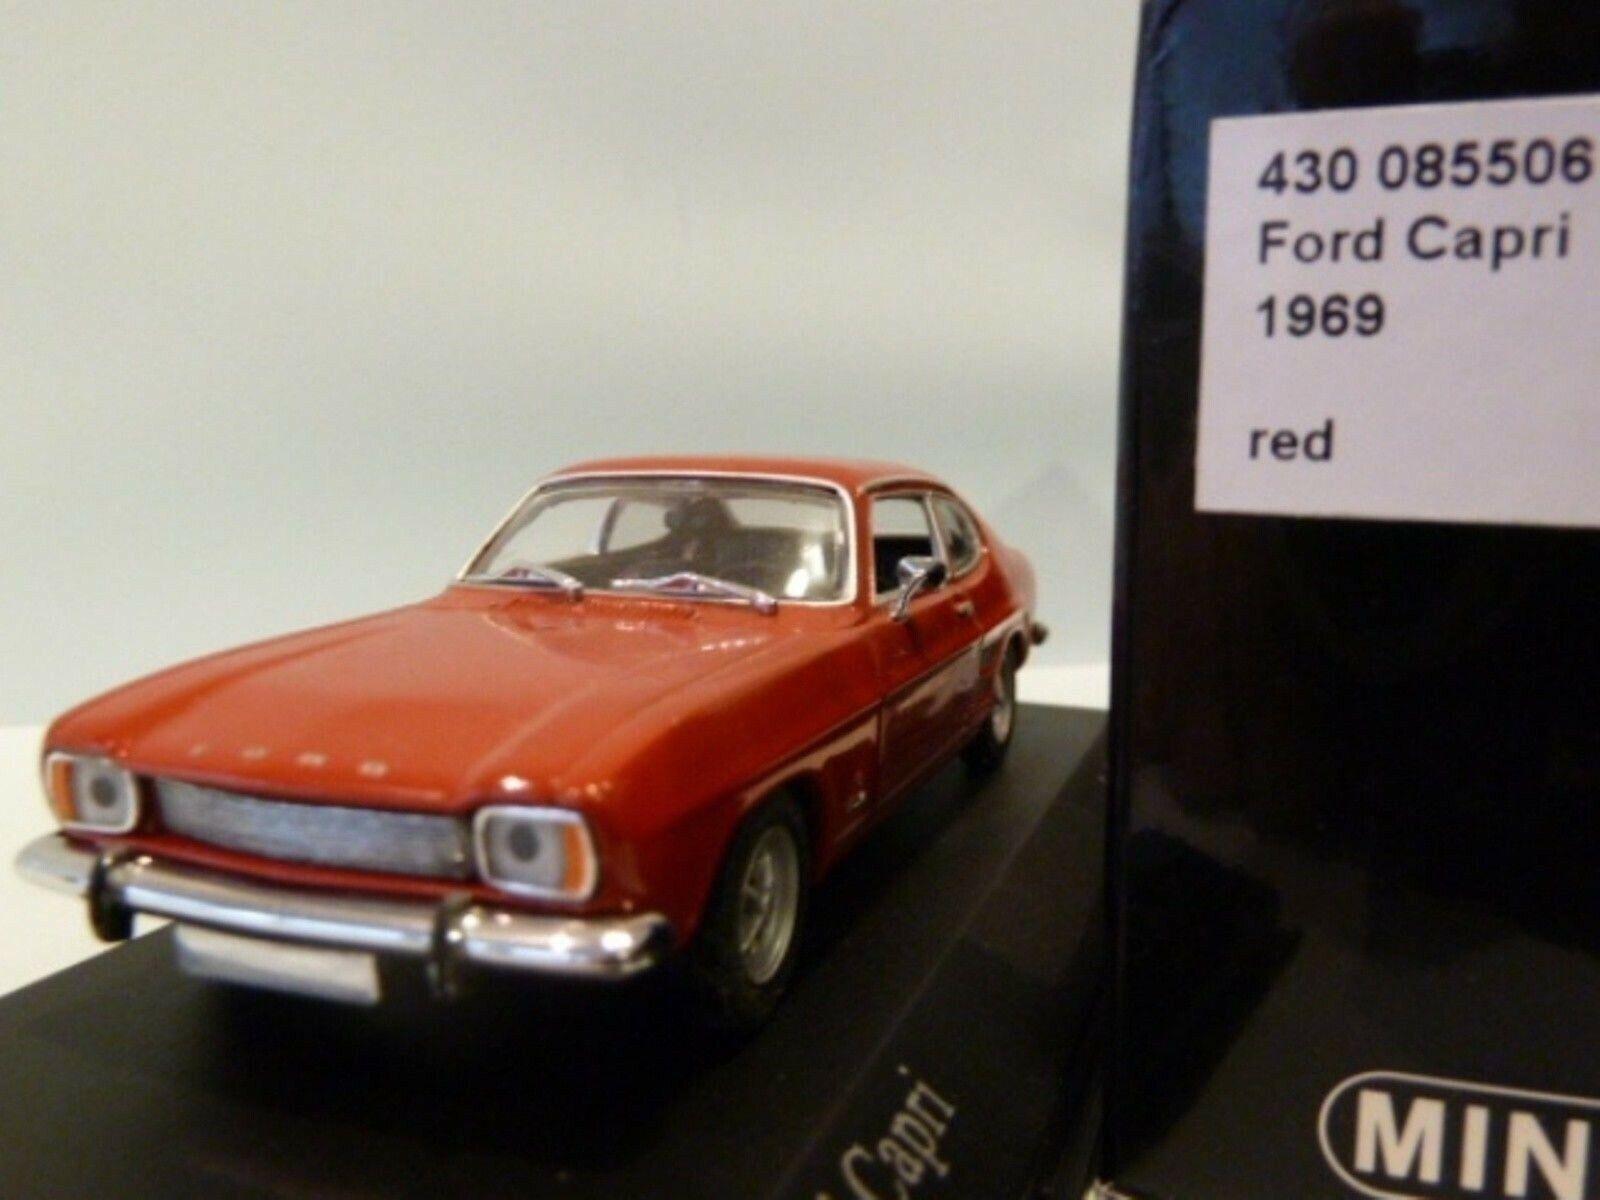 WOW EXTREMELY RARE Ford Capri MkI 1700 GT 1969 Red II 1 43 Minichamps-MkII MkIII